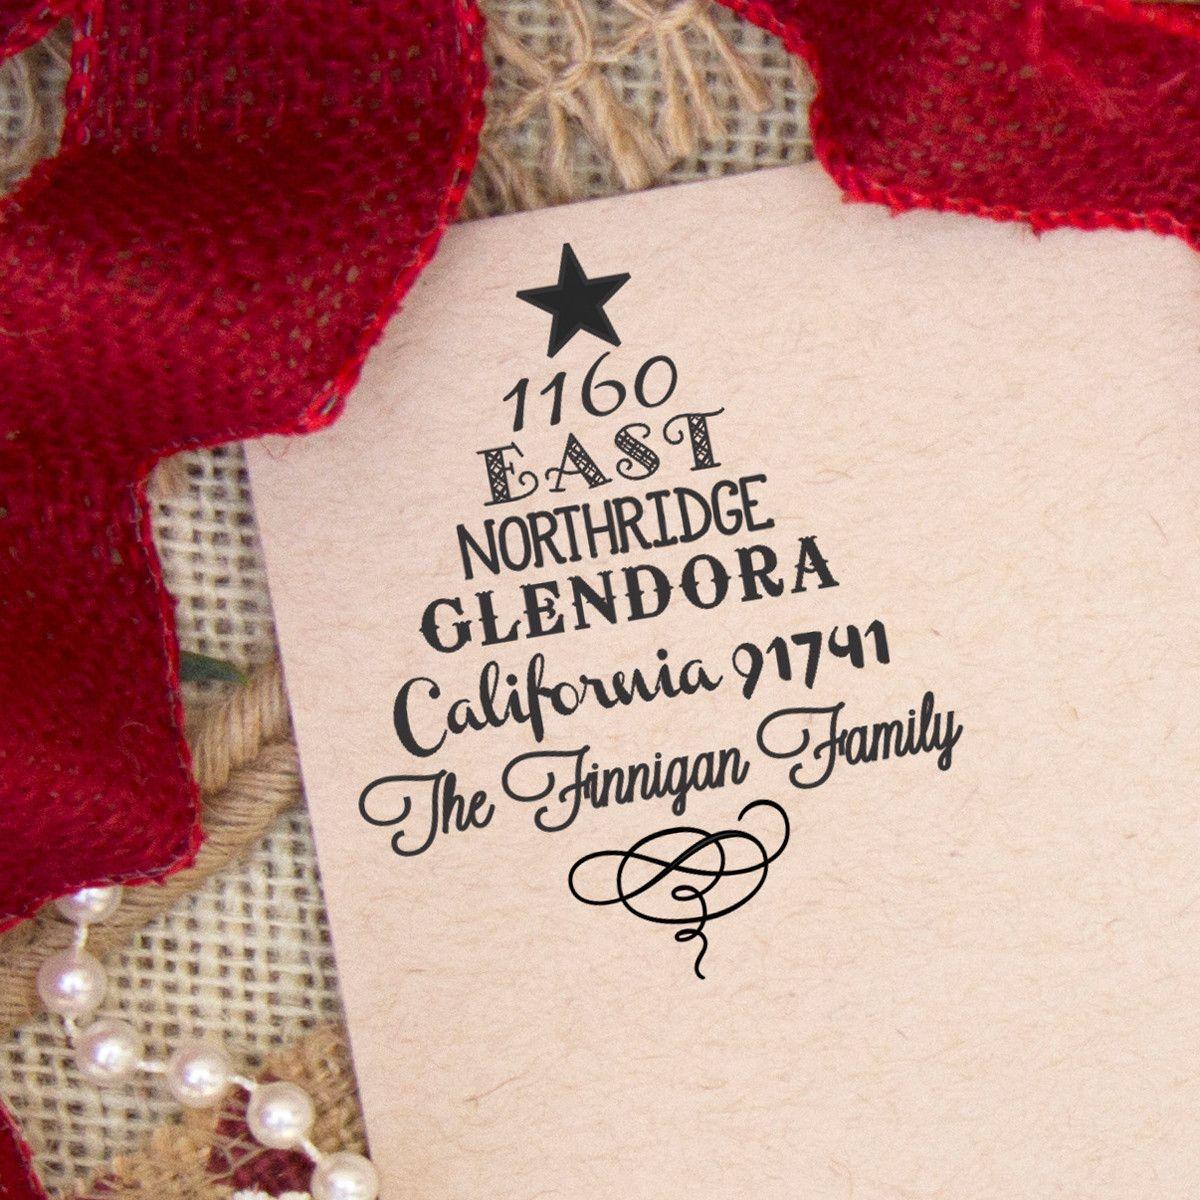 Fancy Wedding Invitation Addressing Etiquette One Envelope Ensign ...